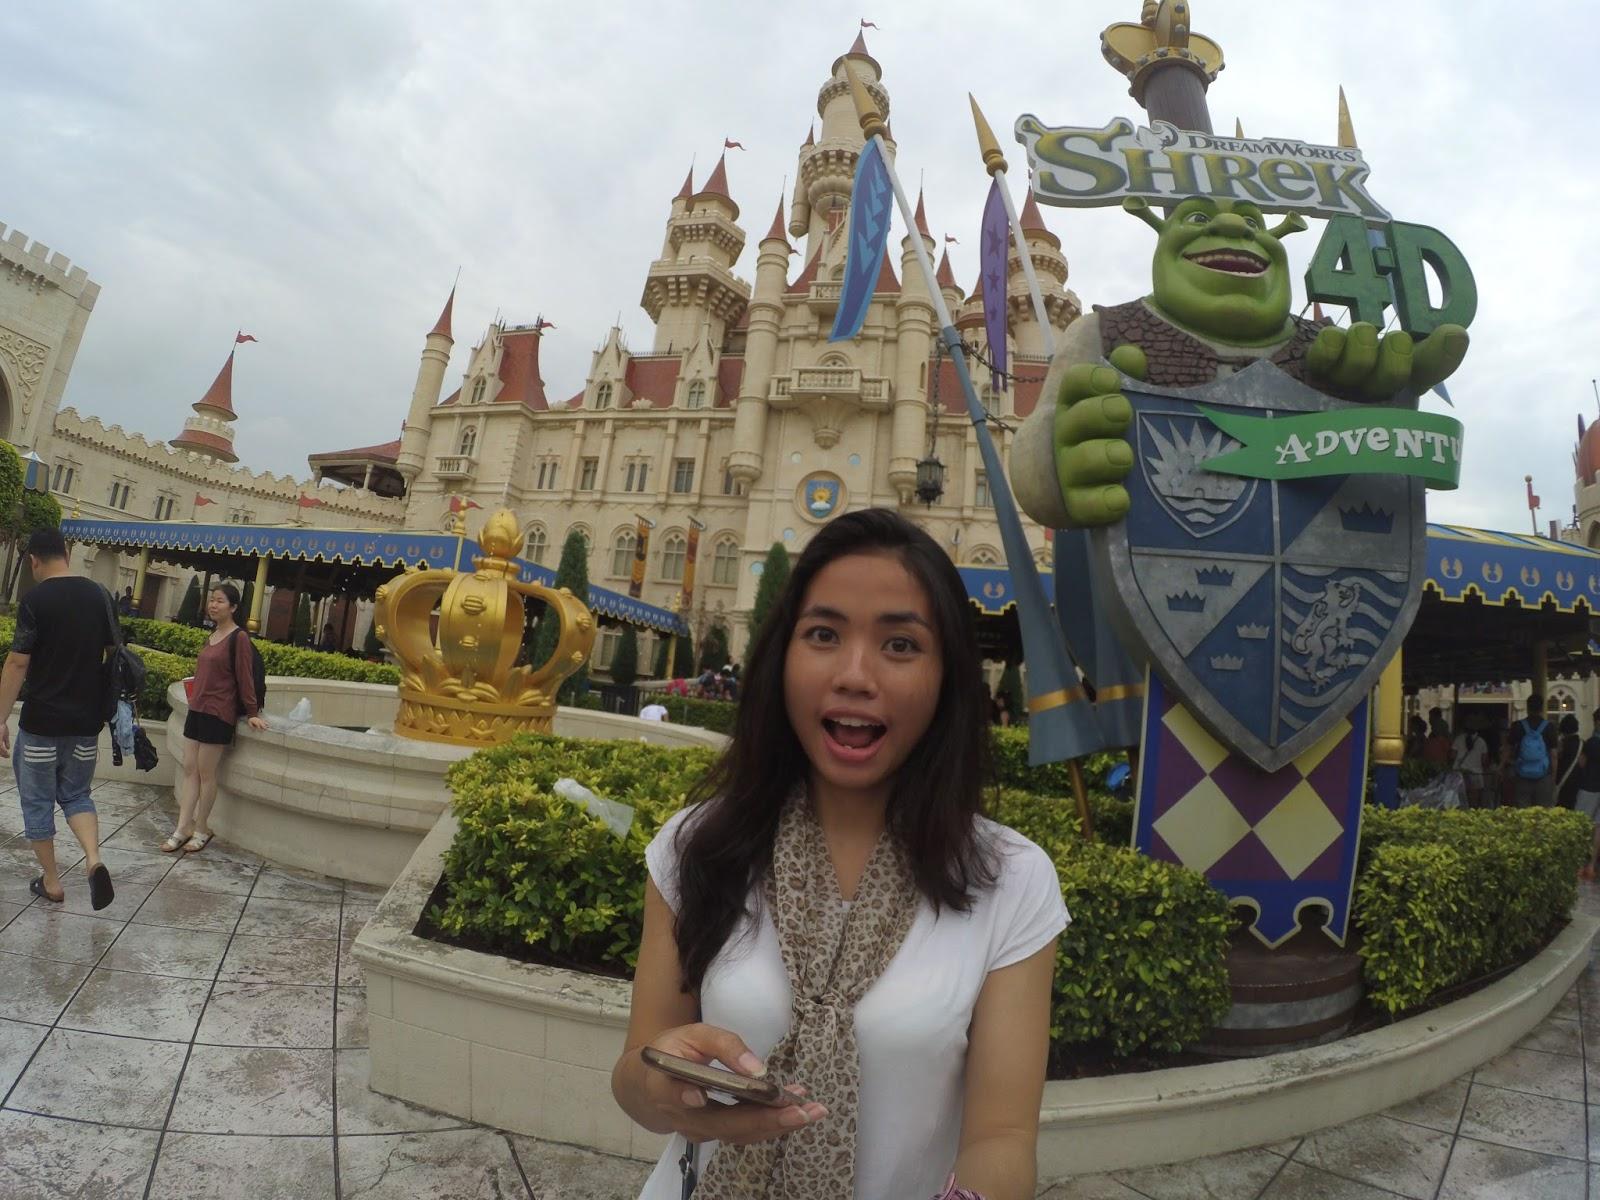 A Day At Universal Studio Singapore Rizka Amalia Windriani Tiket Singapura Anak Area Terakhir Dari Udah Mulai Sepi Dan Masuk Ke Wahana Madagascar Crate Adventure Sama Sekali Gak Antri Karena Banget D